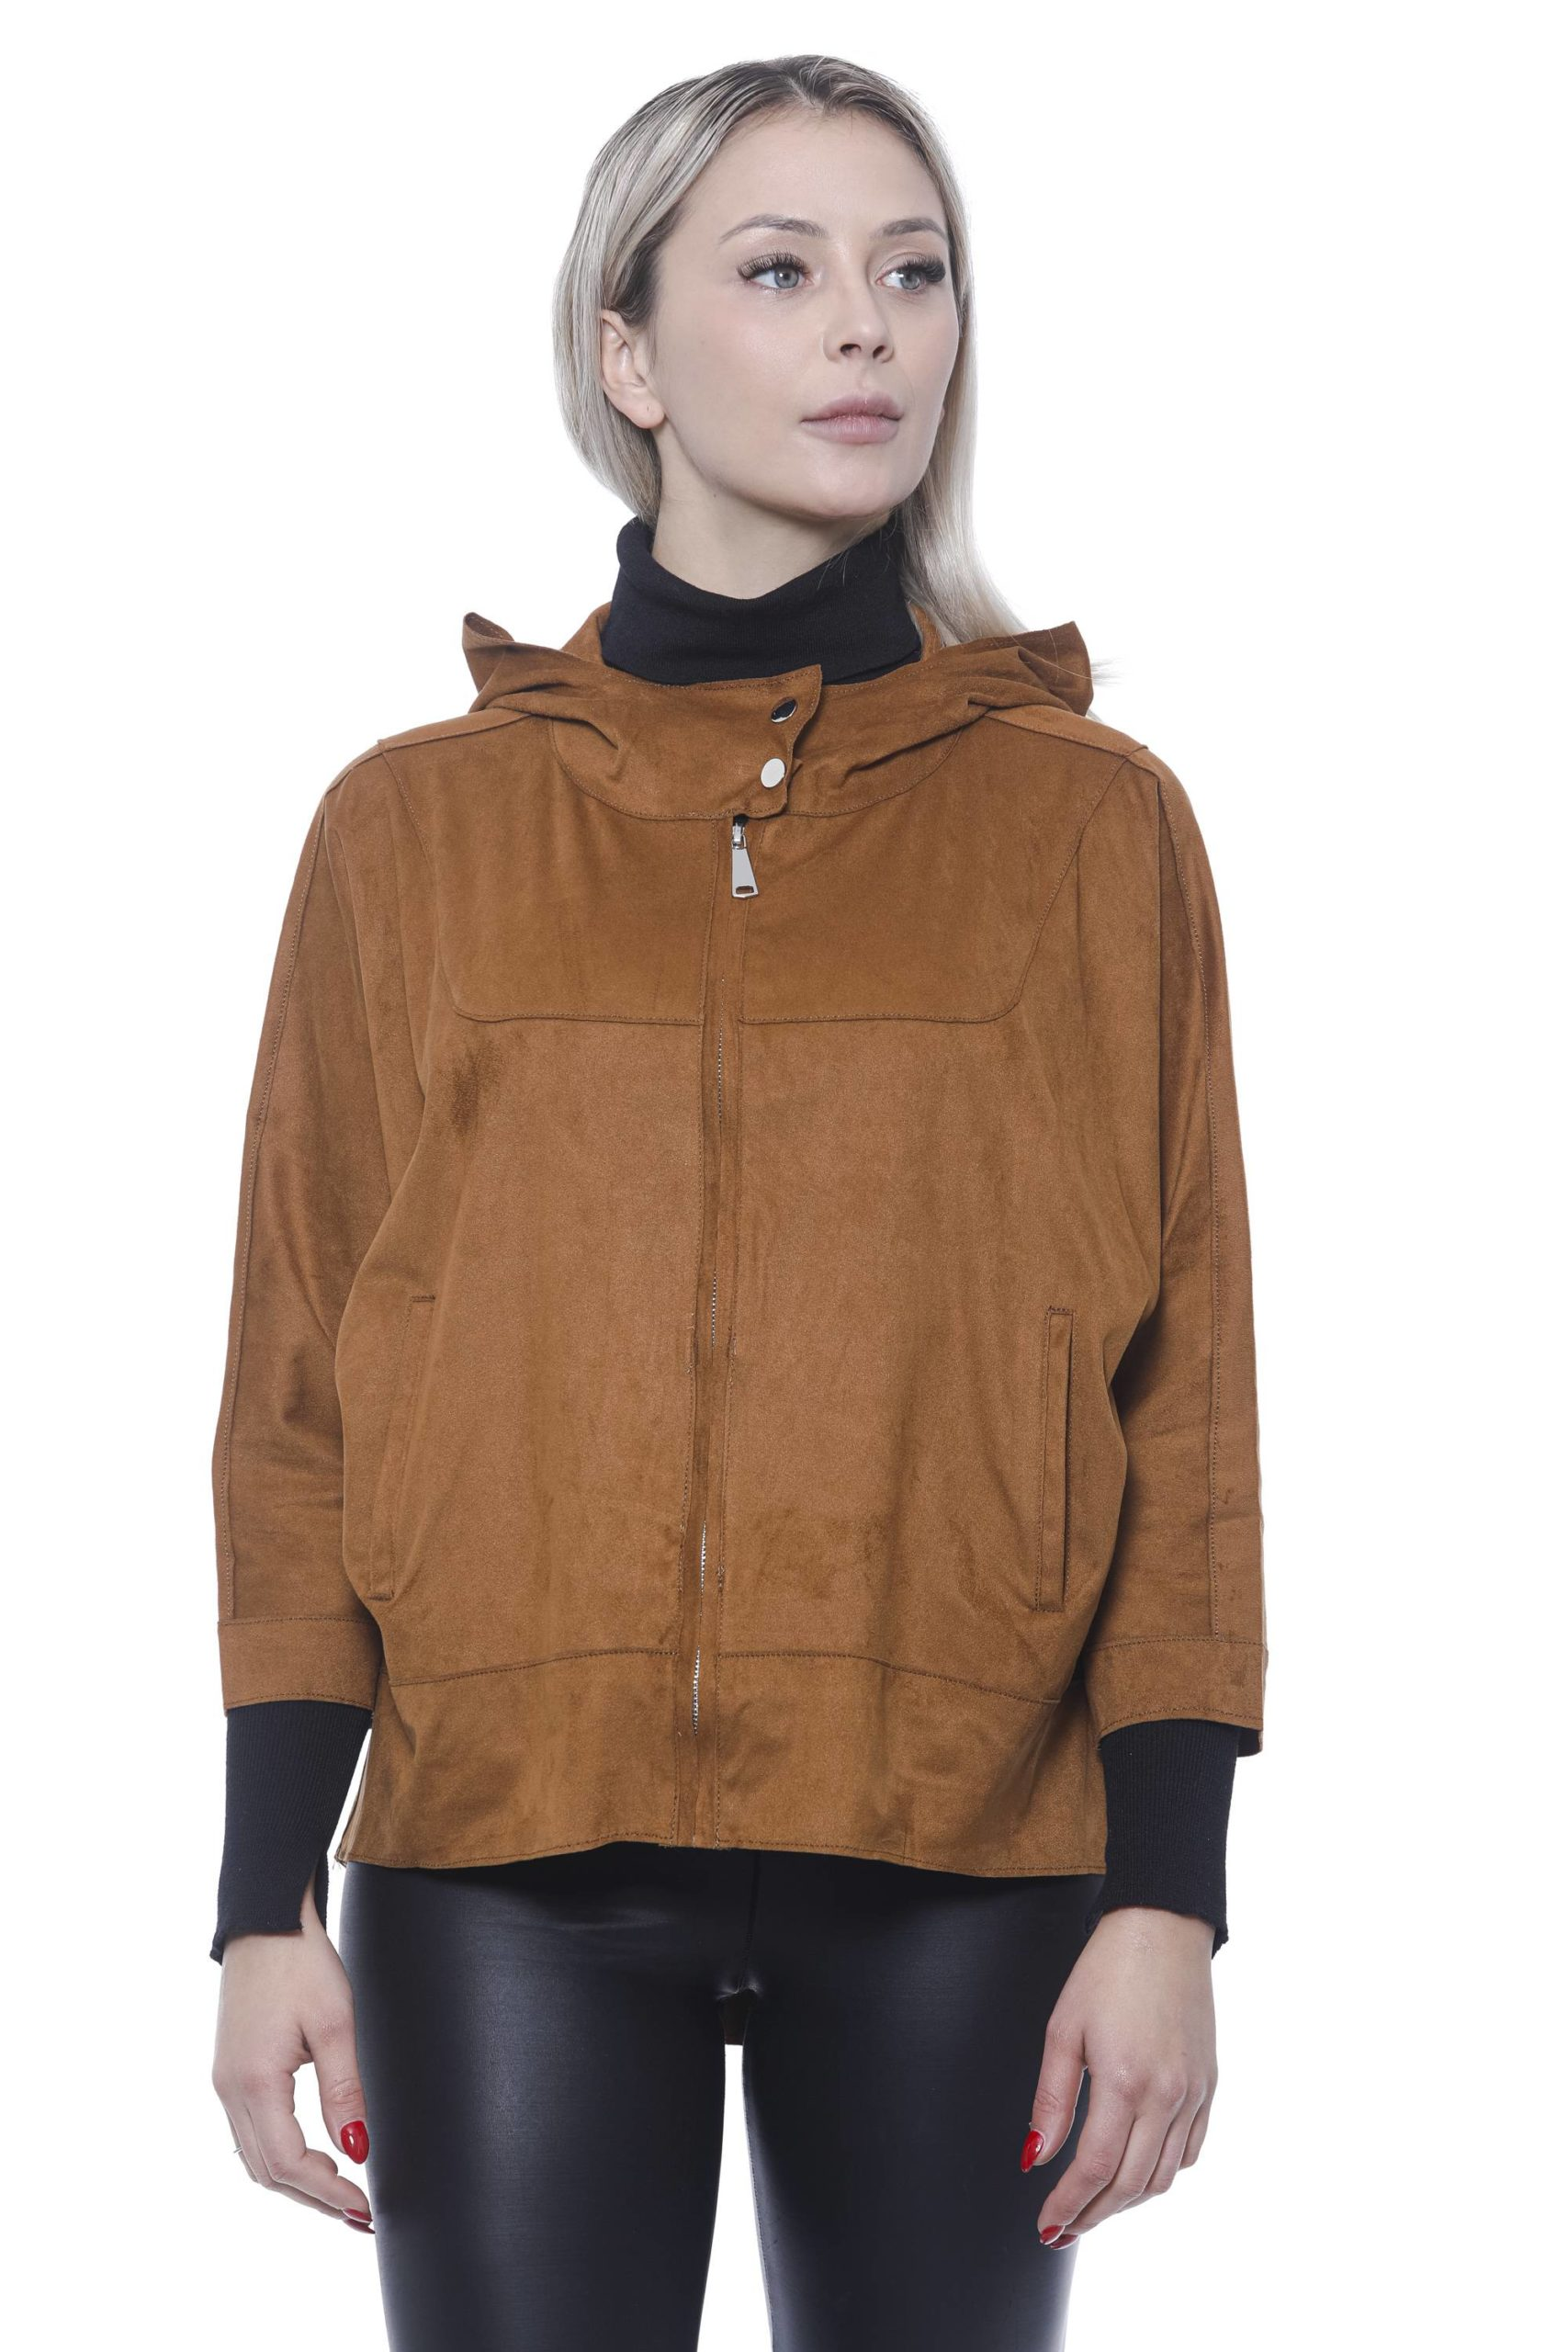 19V69 Italia Women's Cuoio Cuir Jacket 191388479 - IT42   S